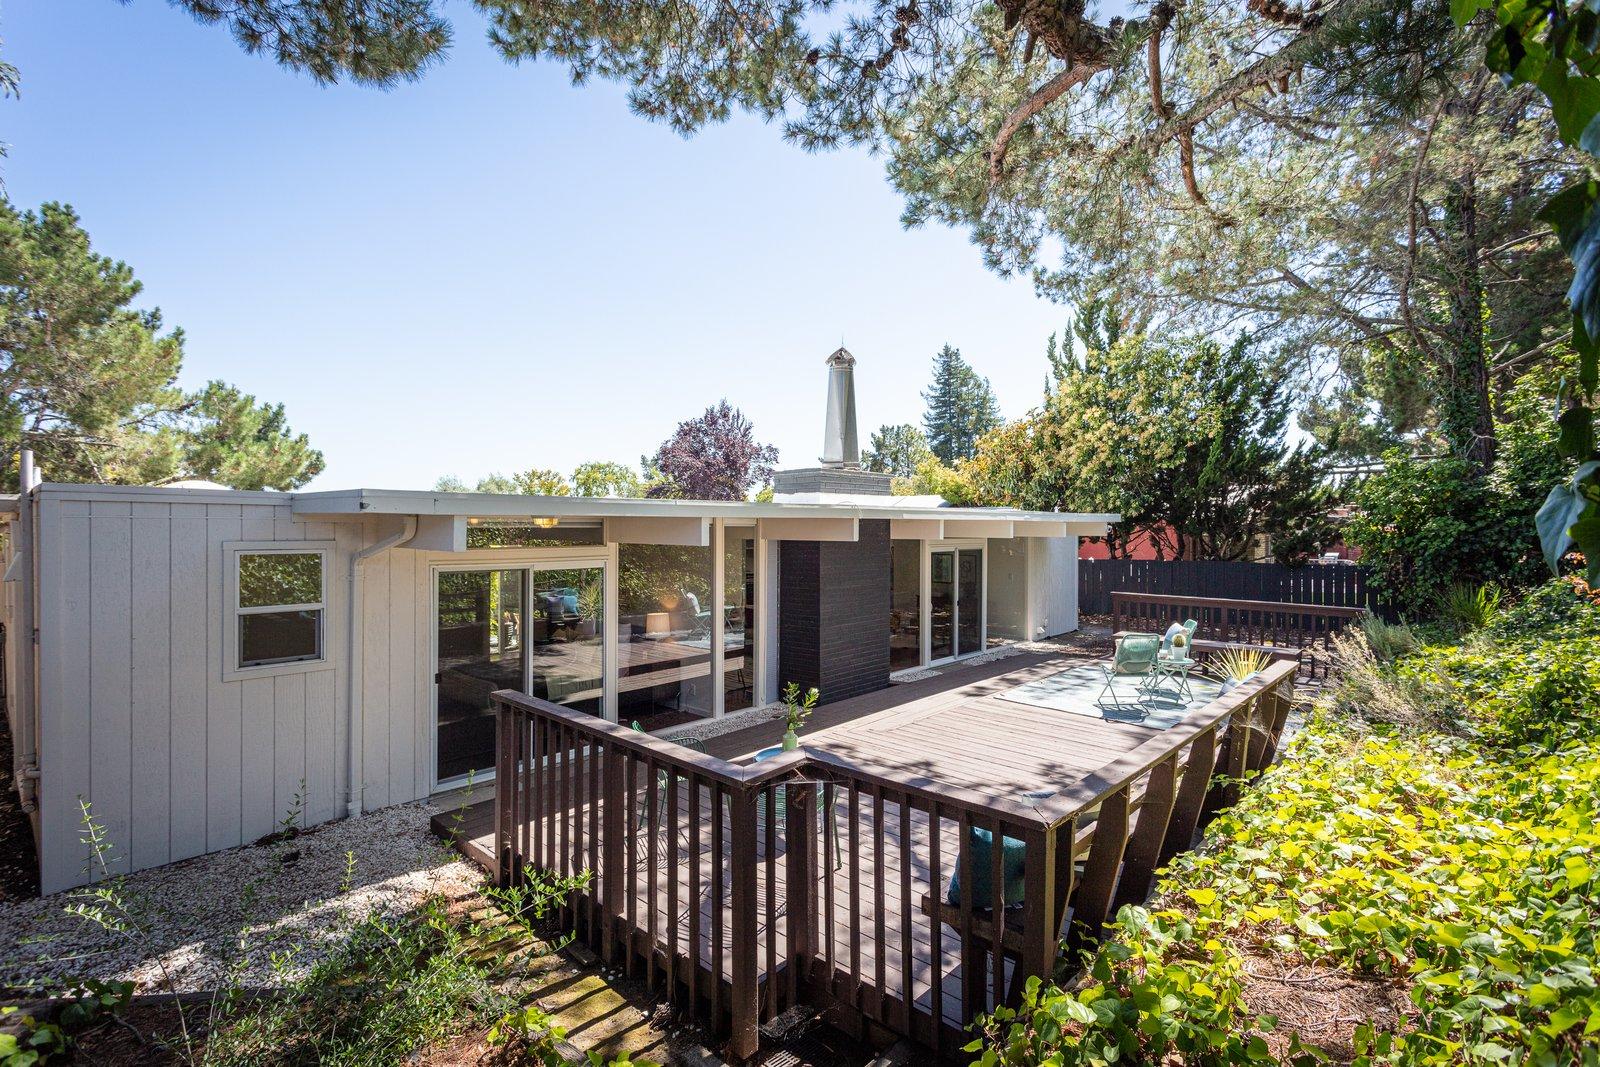 Sequoyah Hills Eichler home backyard